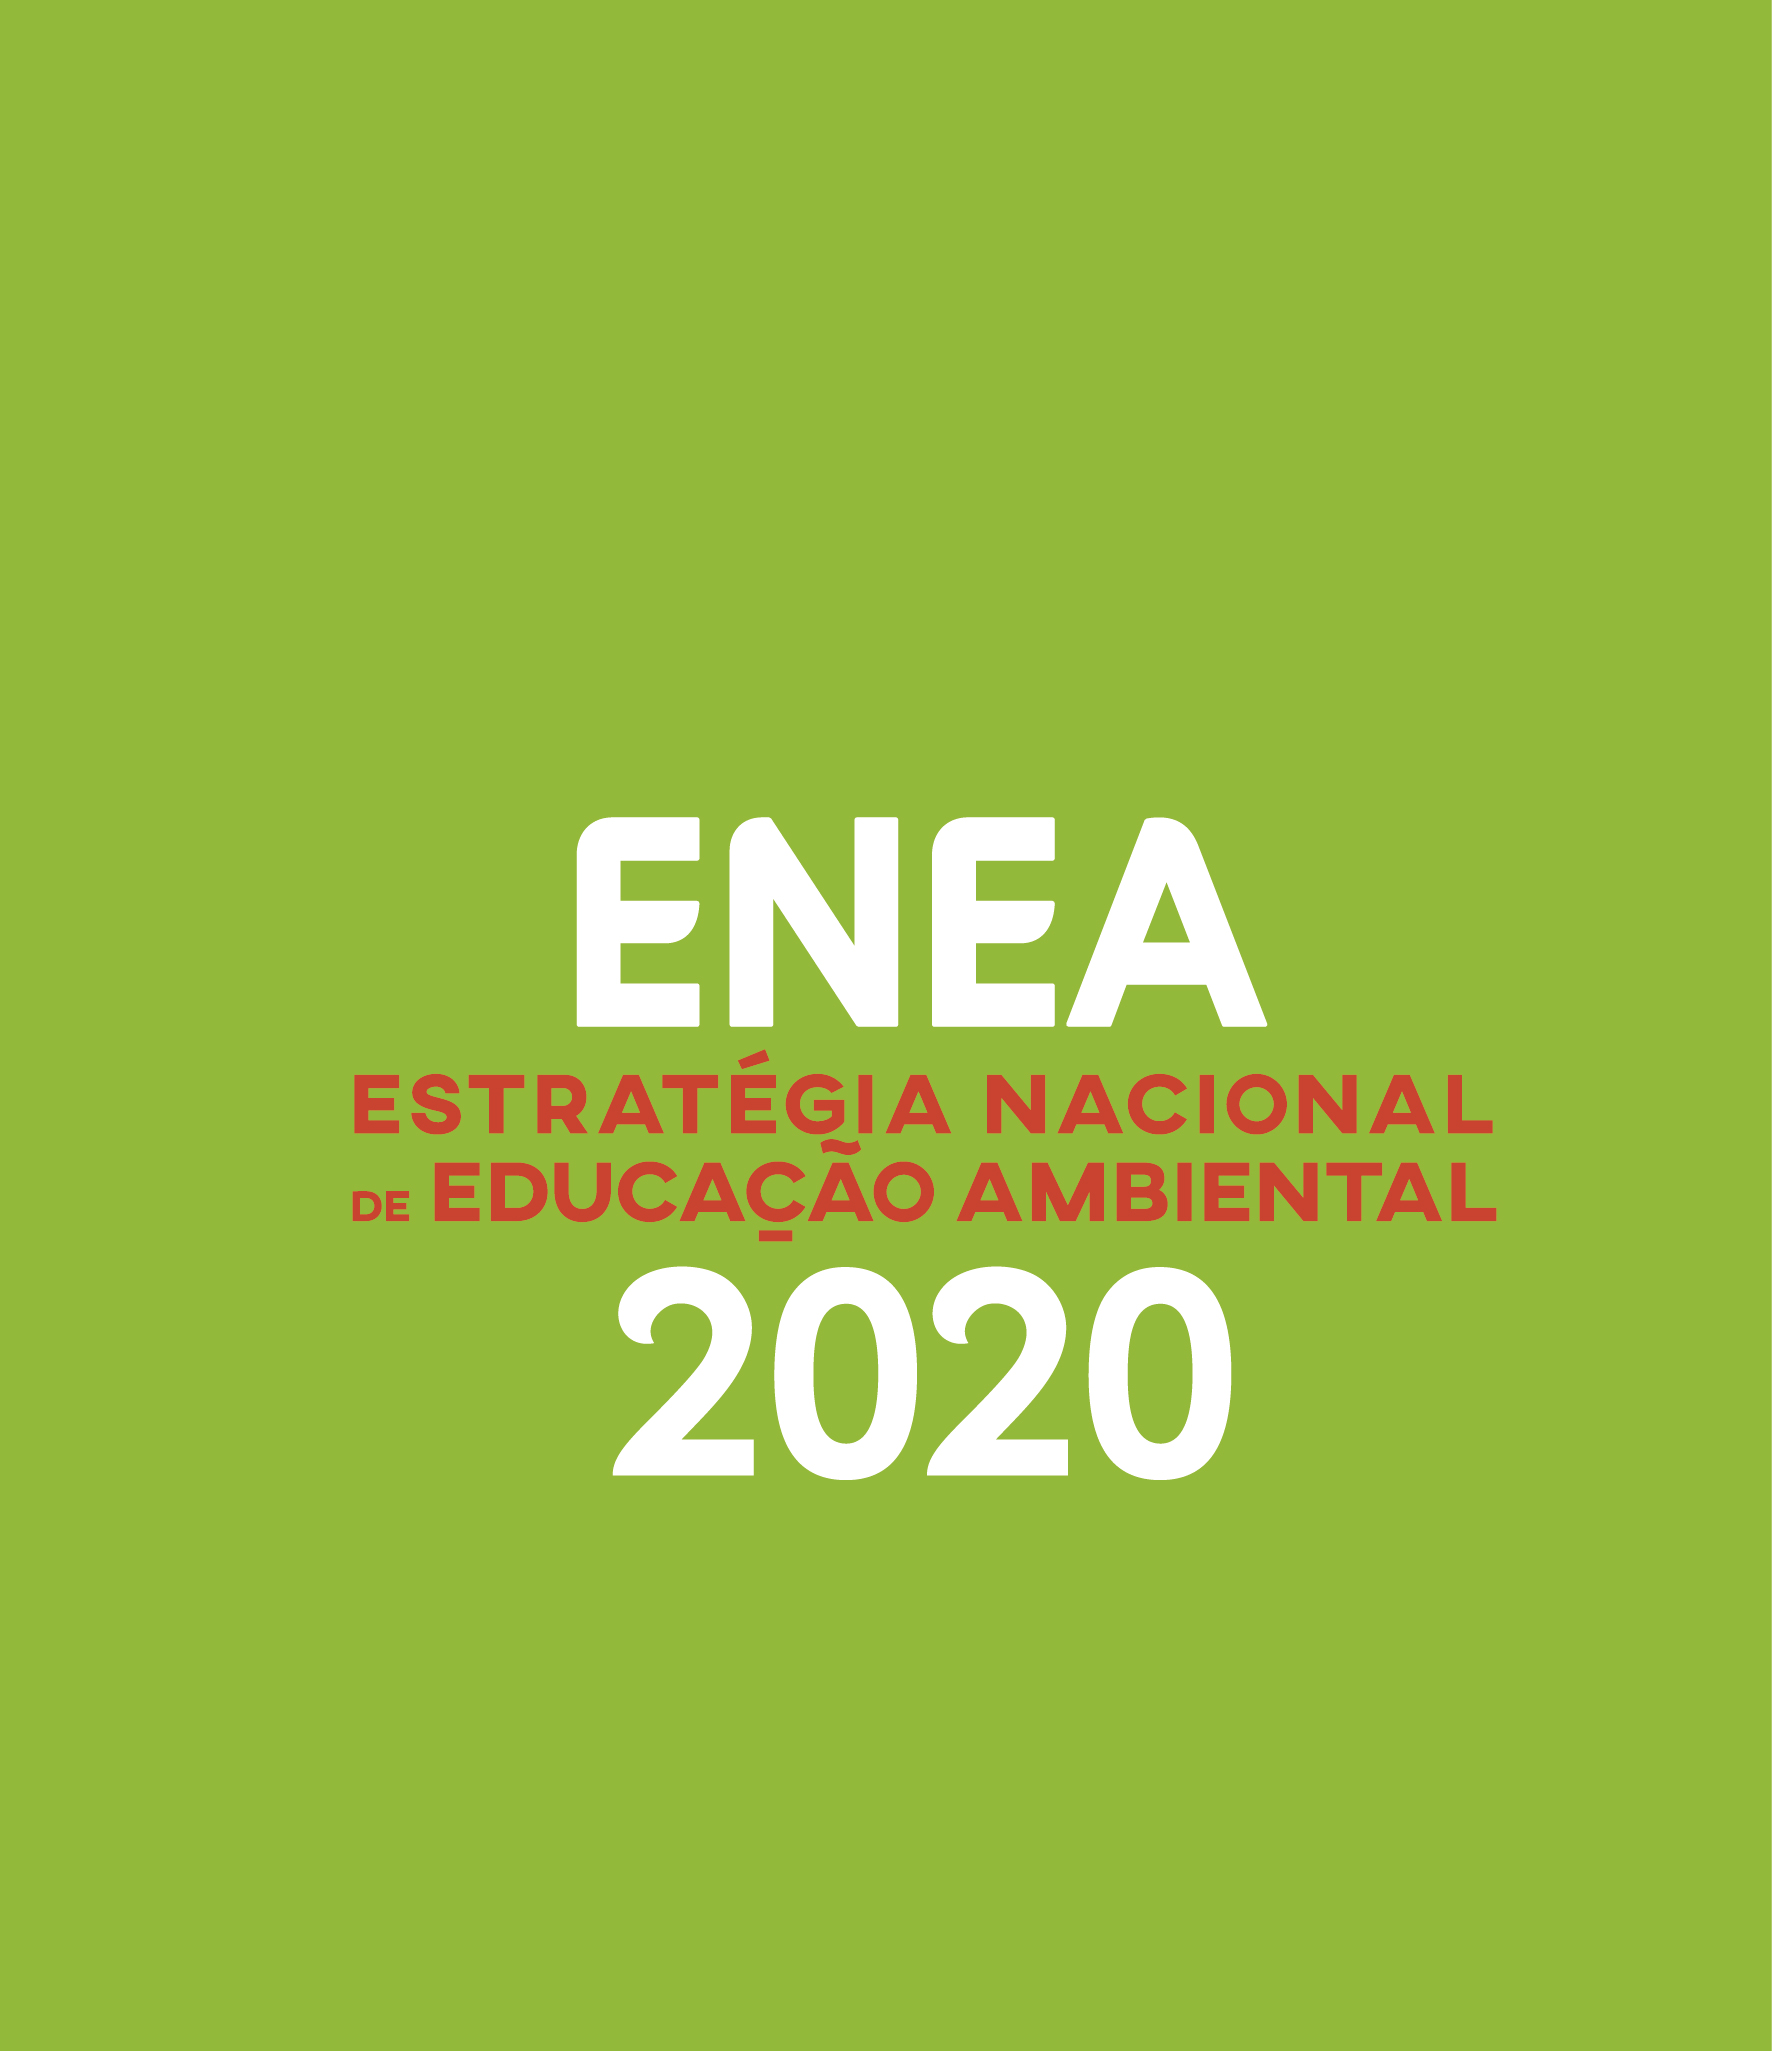 Logo ENEA HorizFundoVerde.jpg